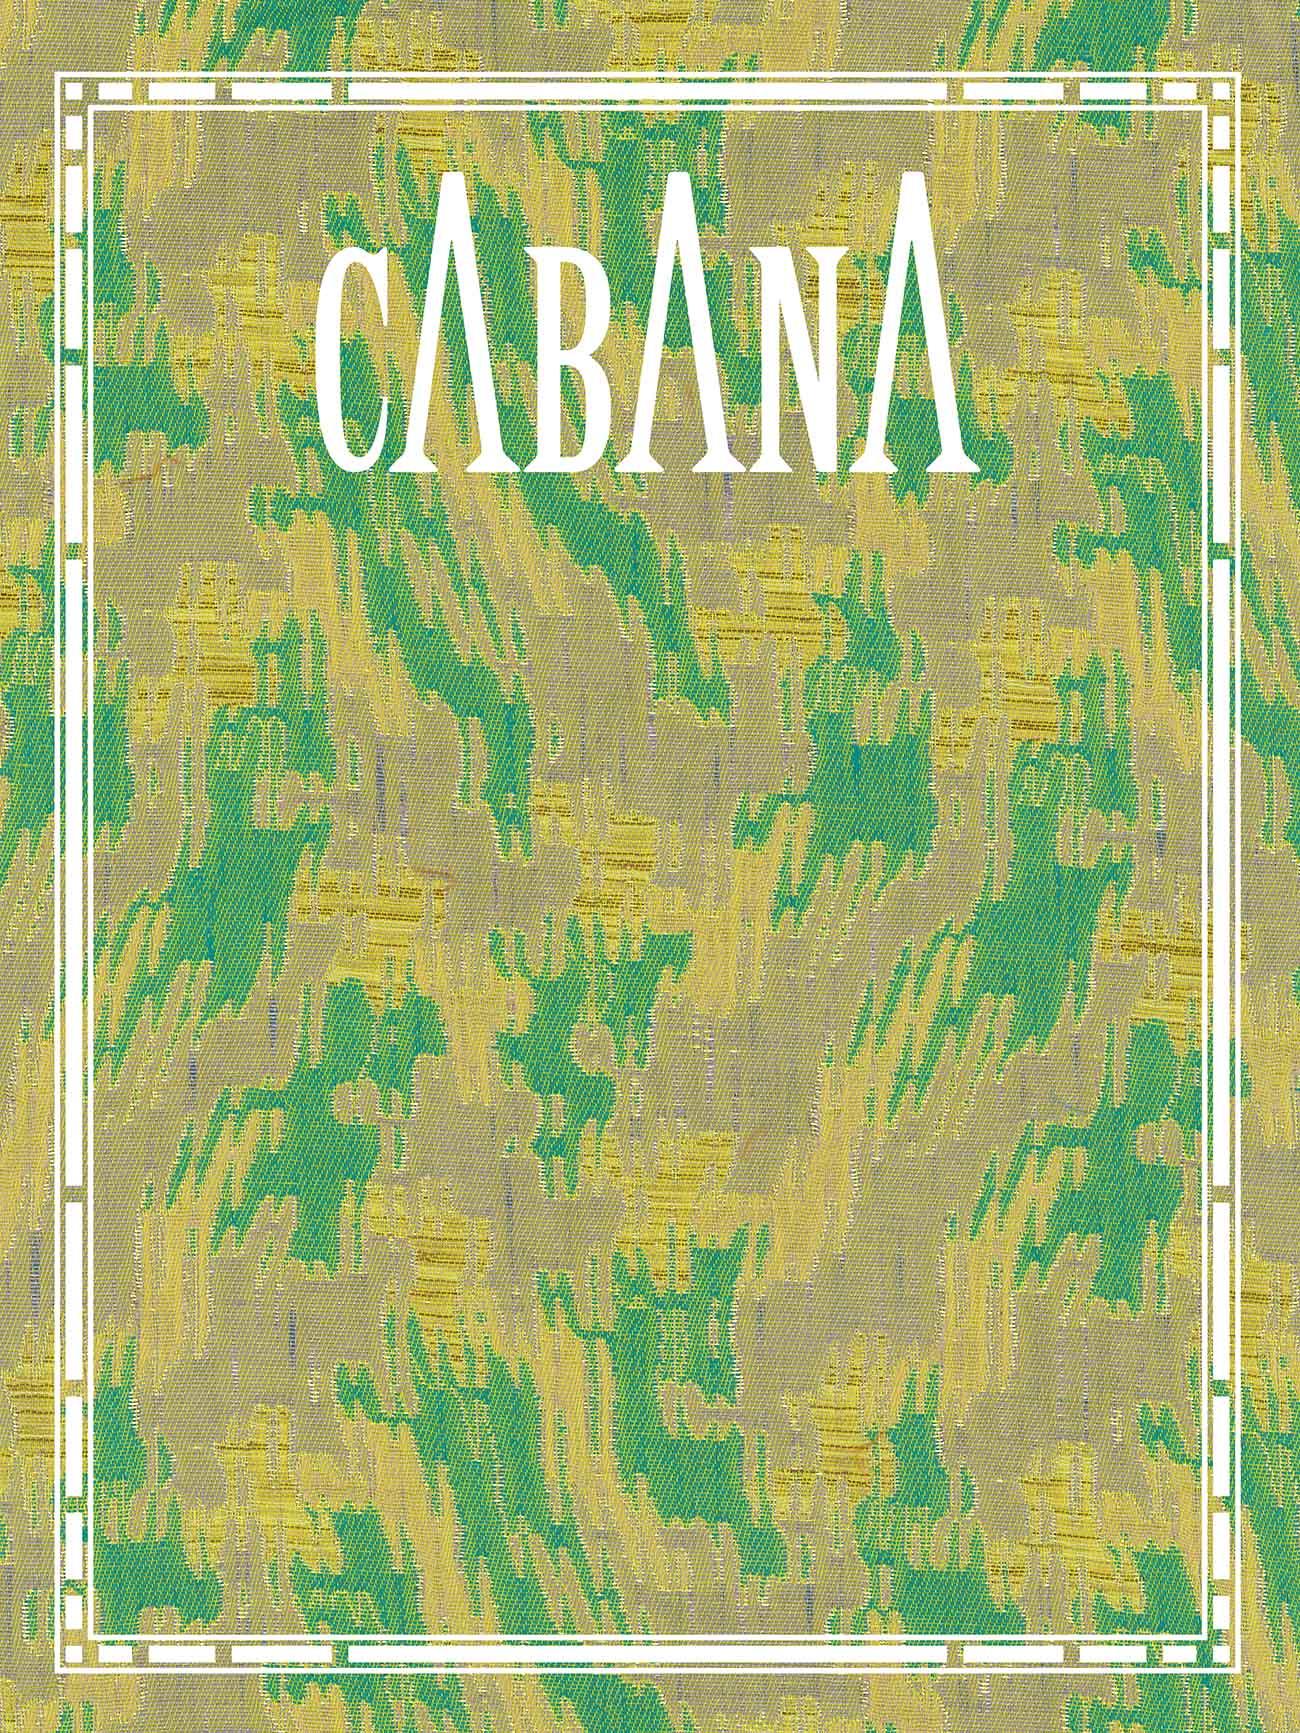 CABANA_Color_001.jpg